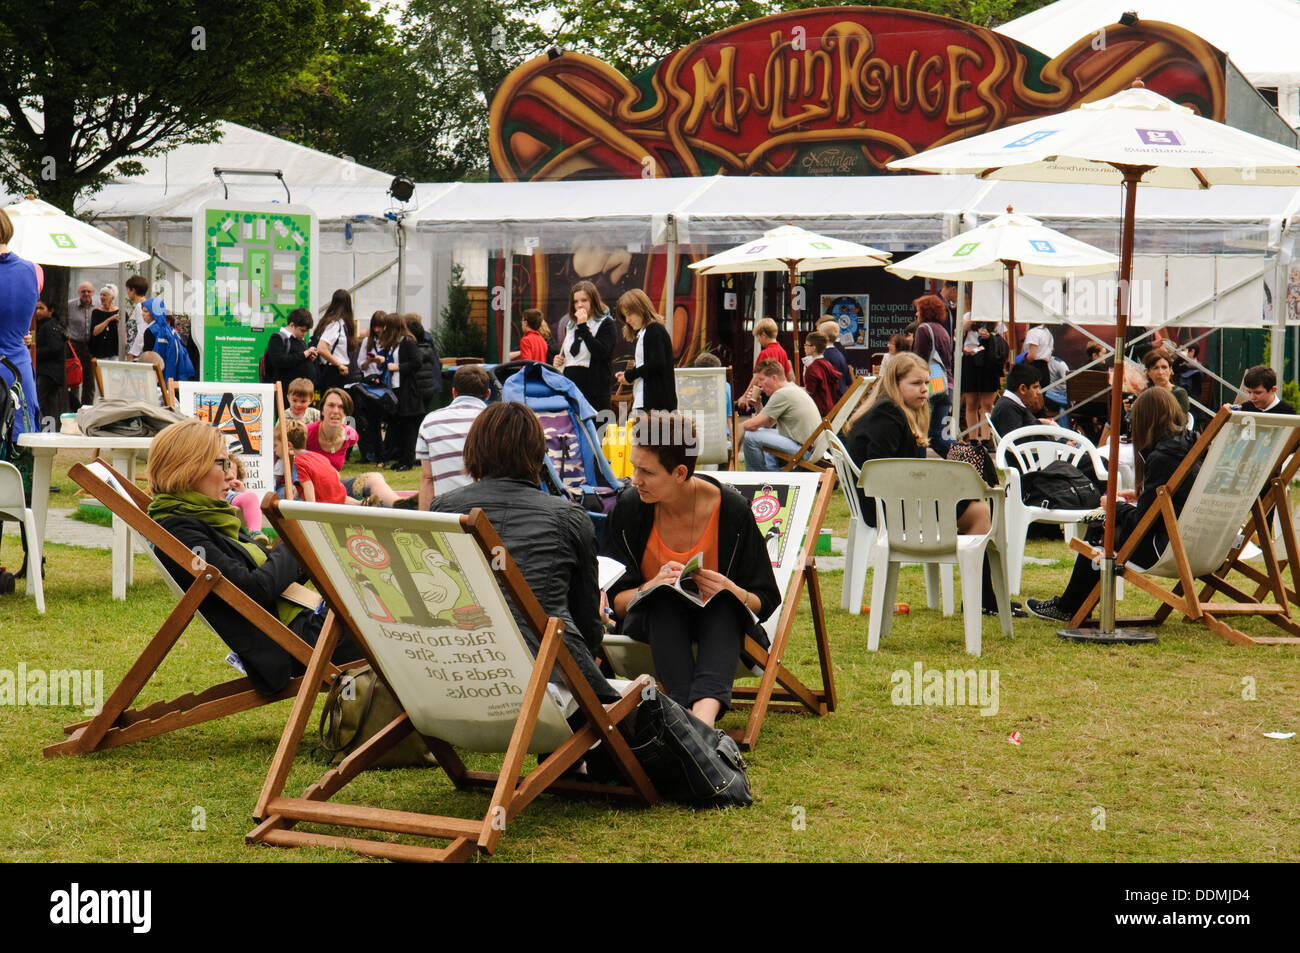 Visitors to the Edinburgh International Book Festival. - Stock Image